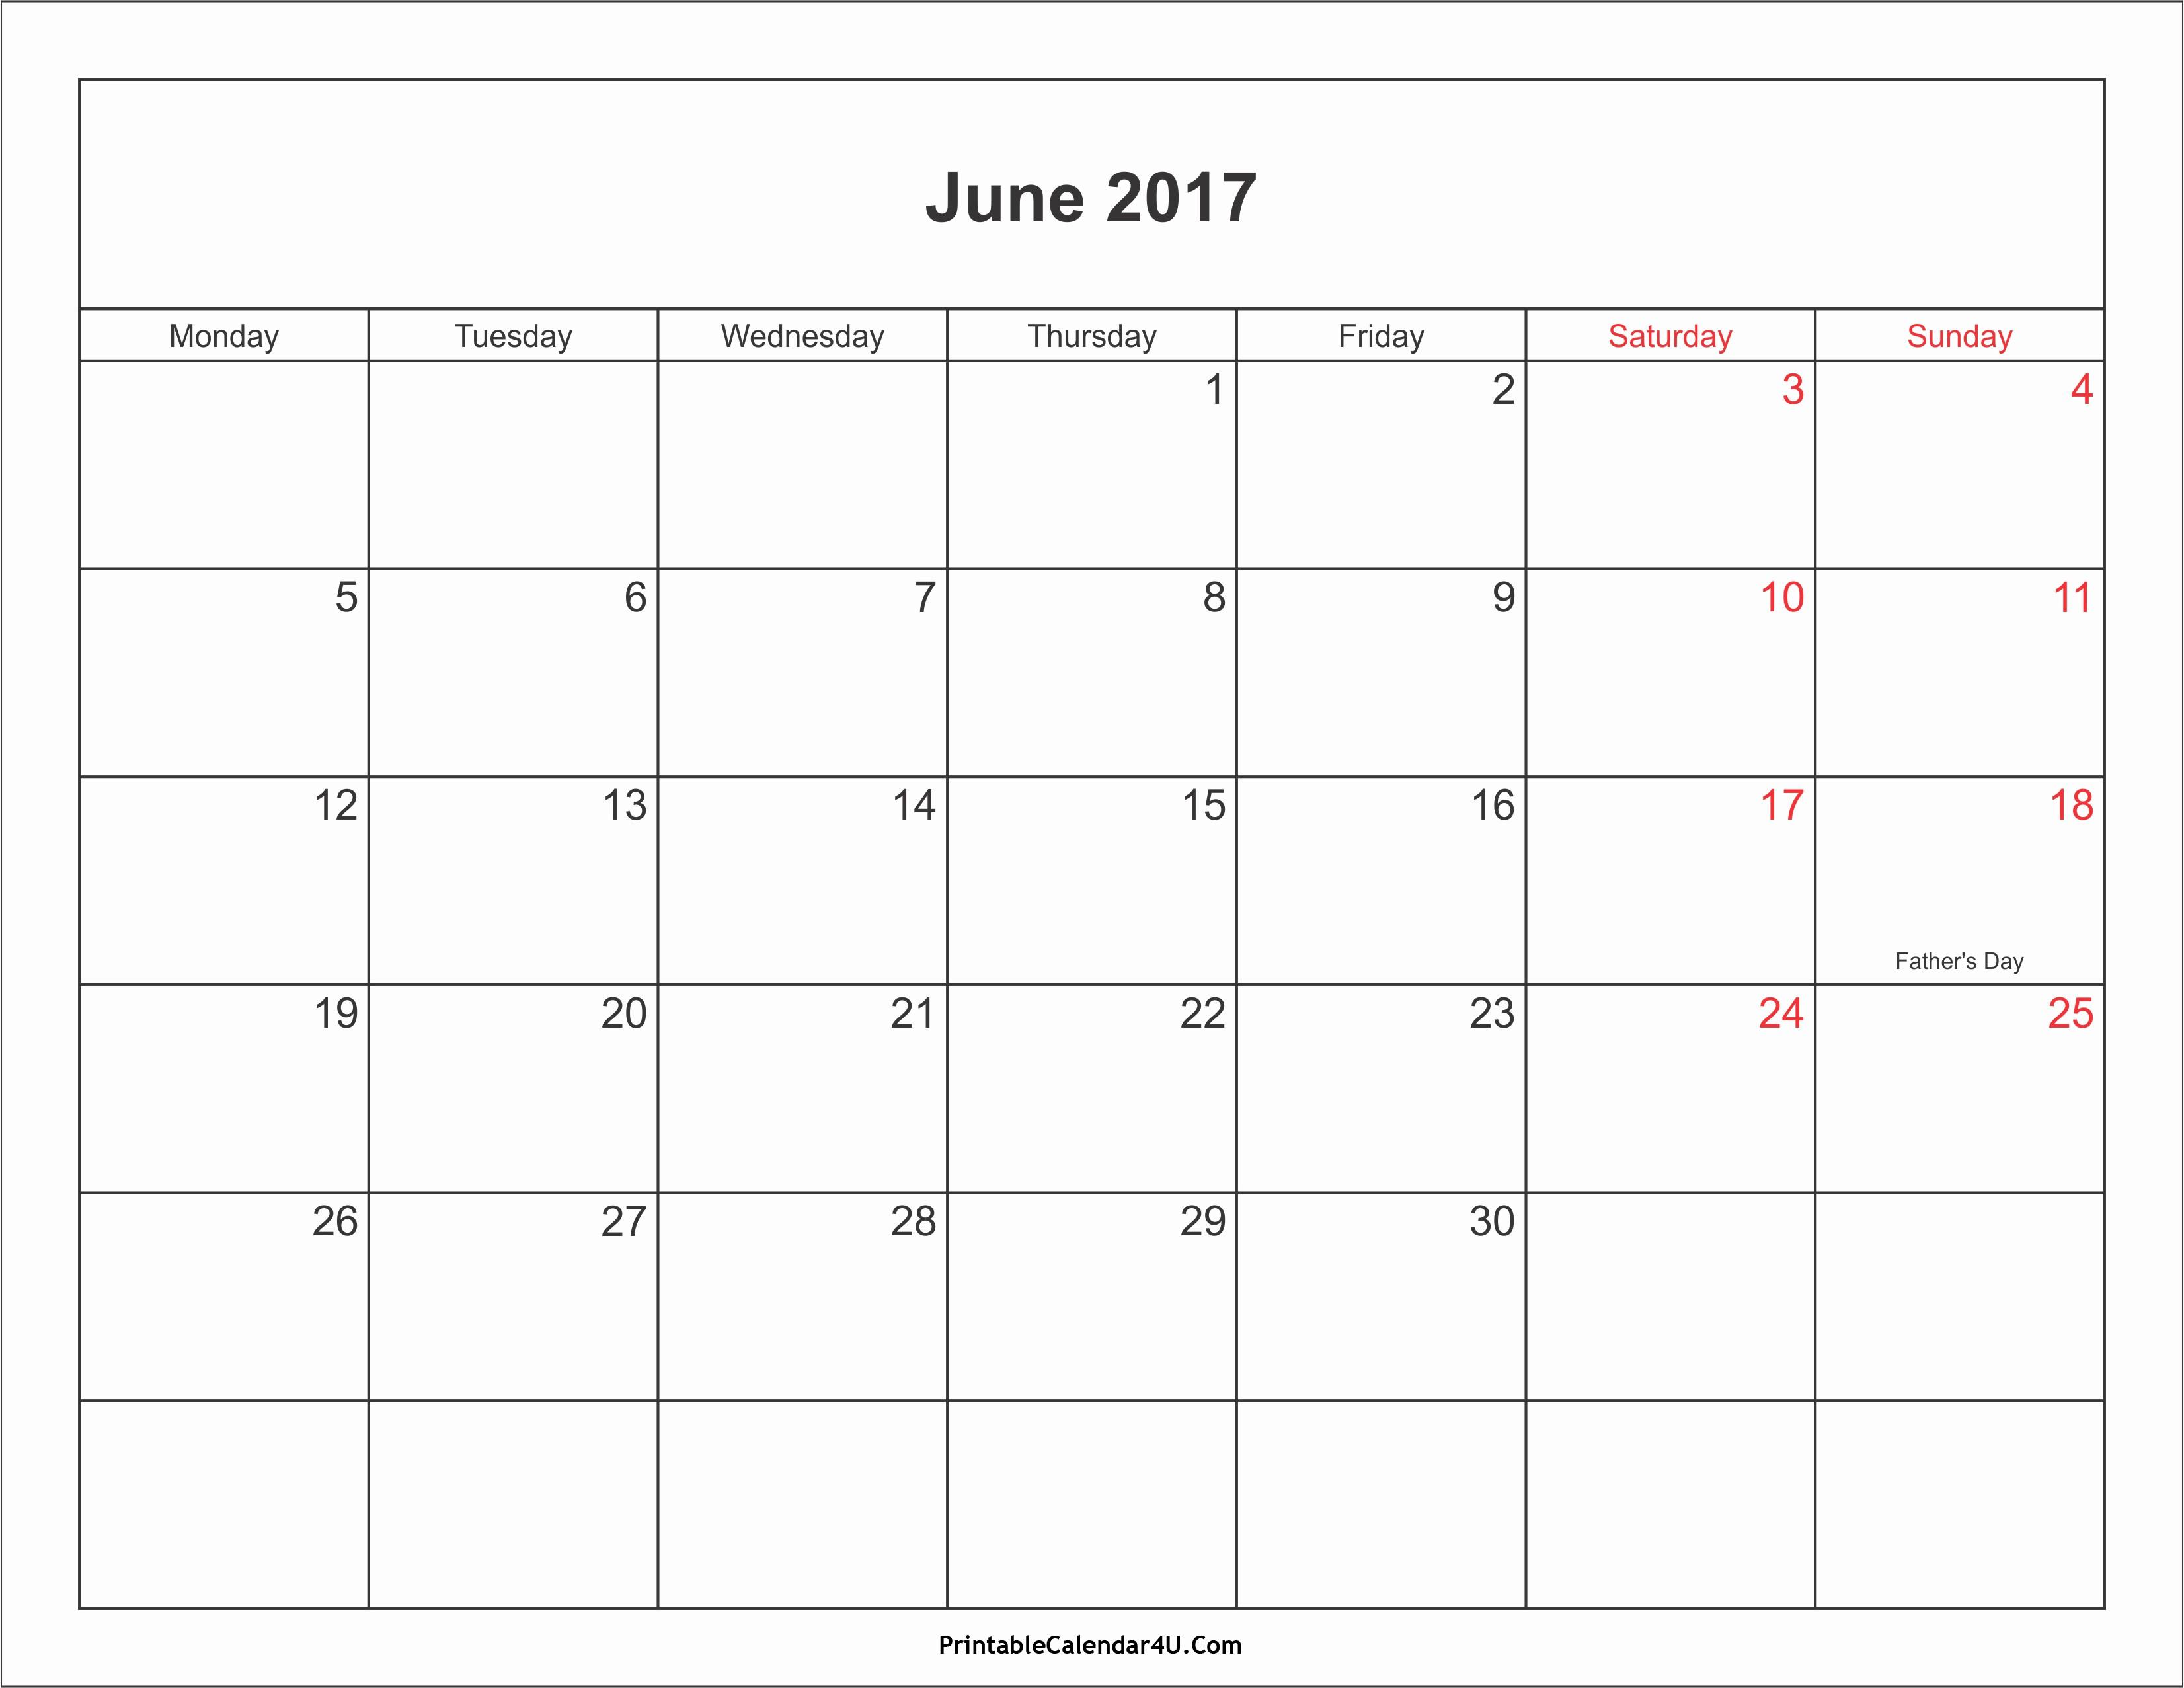 Free Blank Printable Calendar 2017 Elegant June 2017 Calendar Printable with Holidays Pdf and Jpg